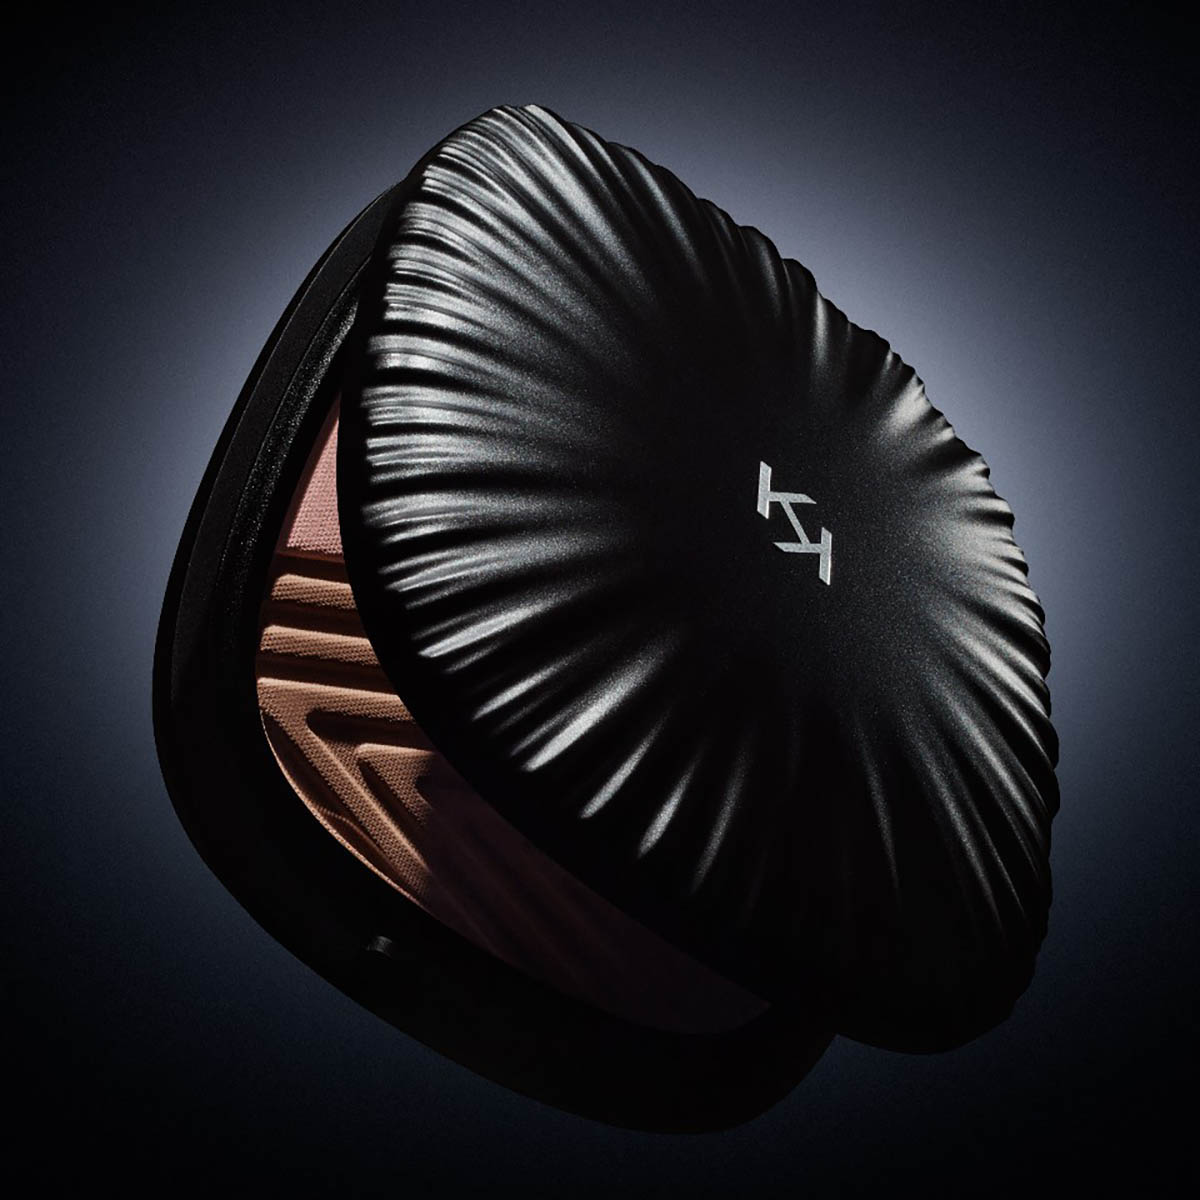 kiko-milano-neo-noir-ross-lovegrove-computational-design-andrea-locatelli-01.jpg